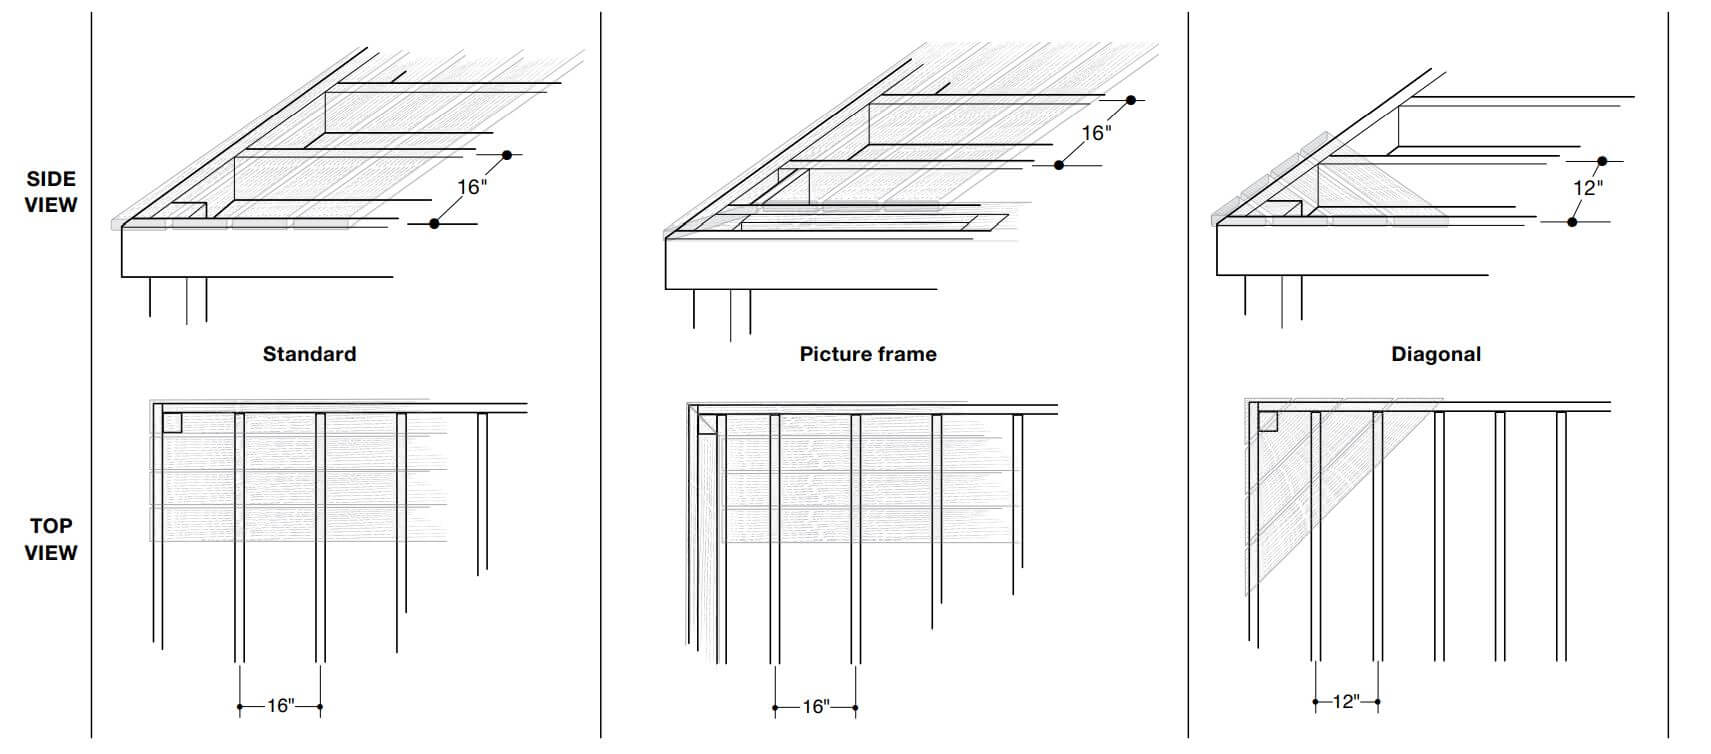 Mineral Composite Decking Installation Diagram